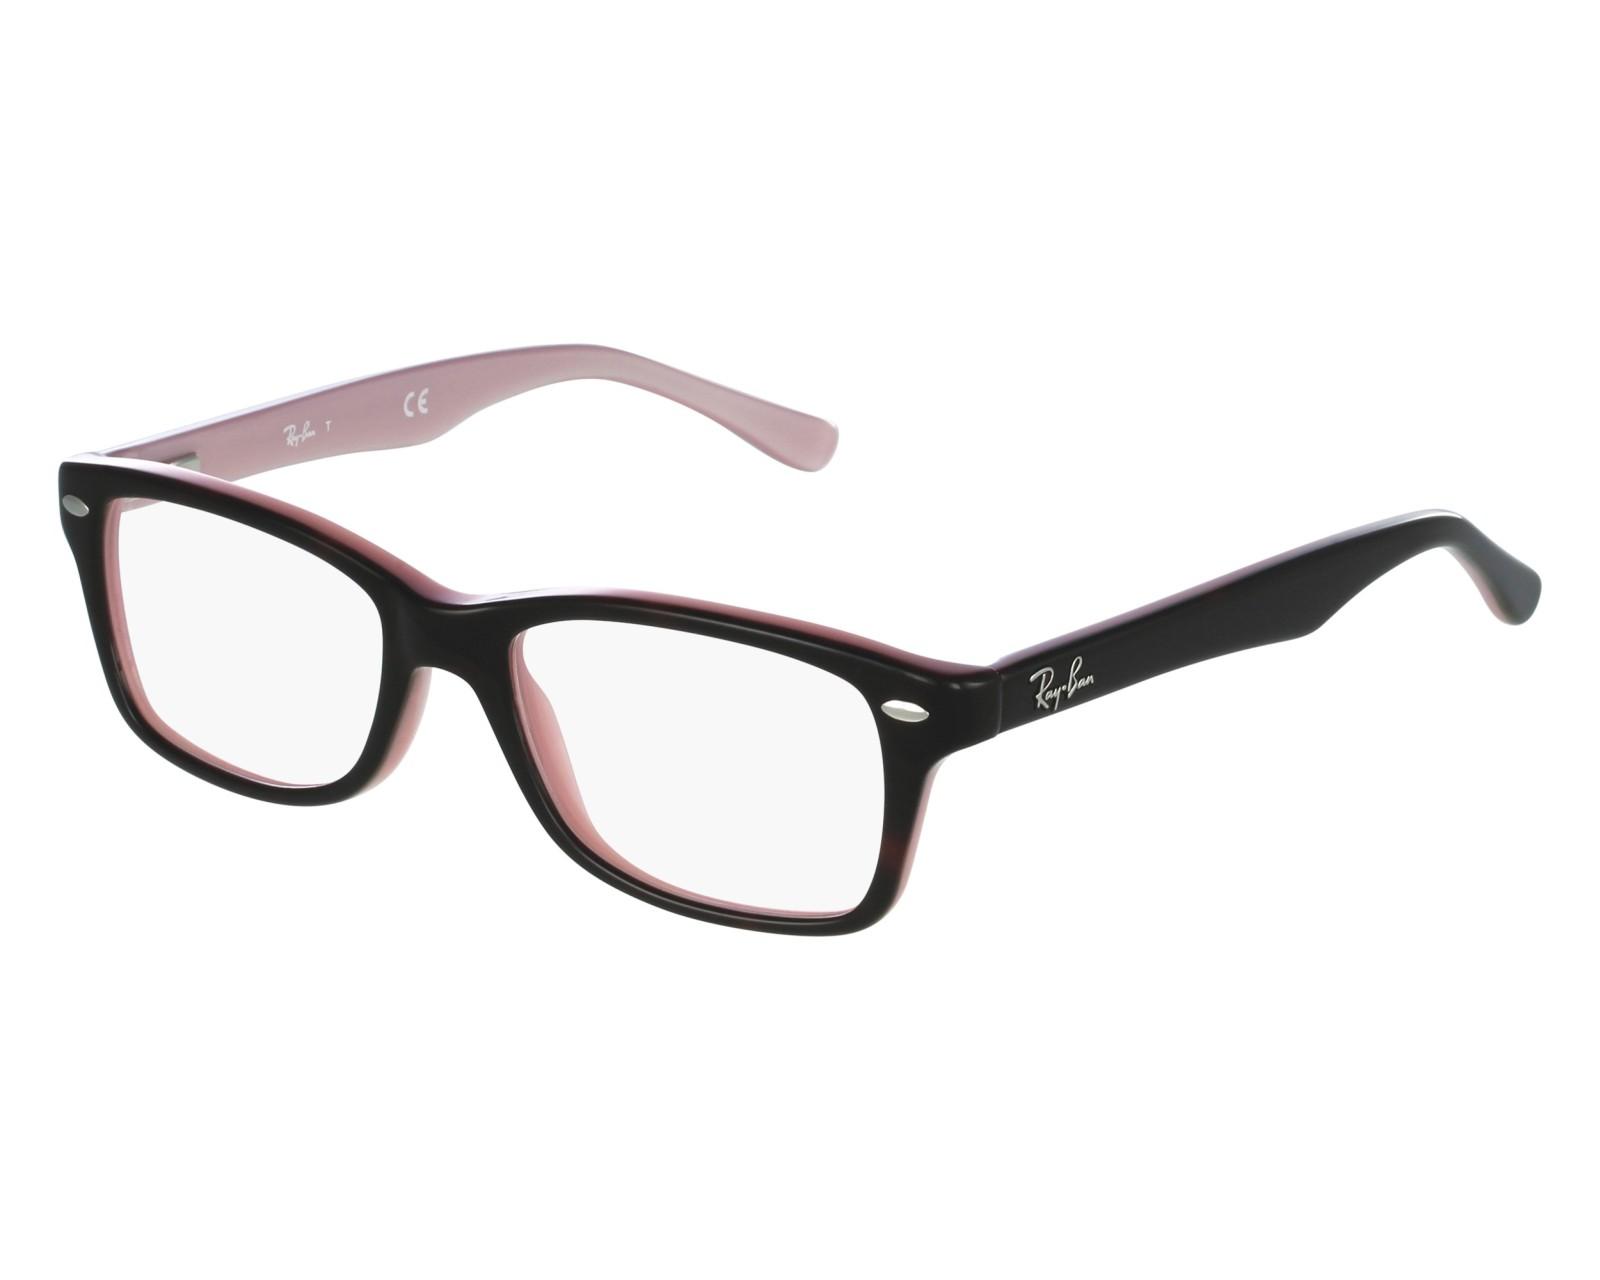 2d22030230 Gafas Graduadas Ray-Ban RY-1531 3580 48-16 Negra Rosa vista de